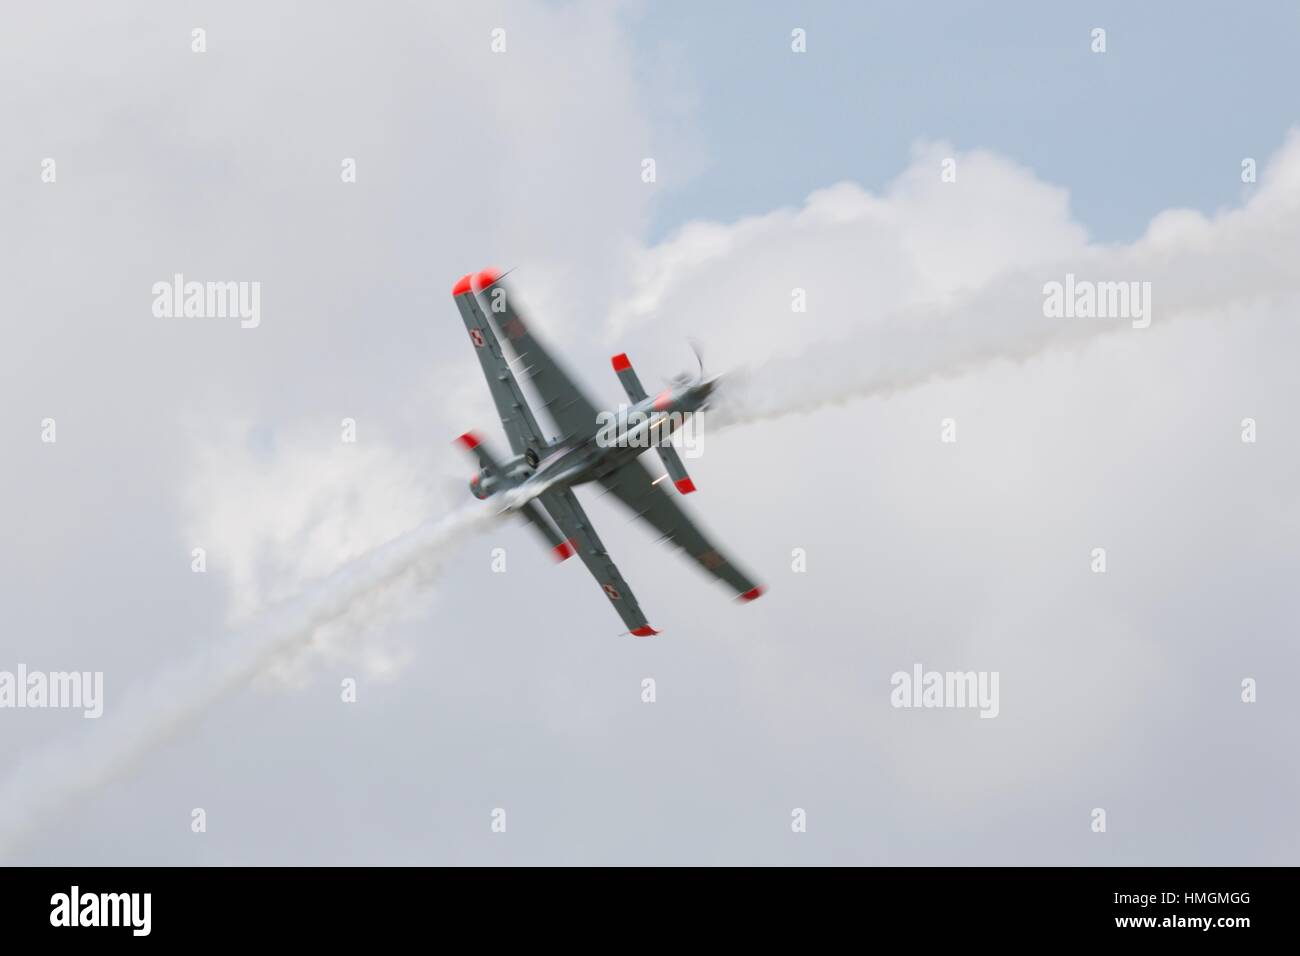 Polish Air Force Orlik Aerobatic Team - Stock Image